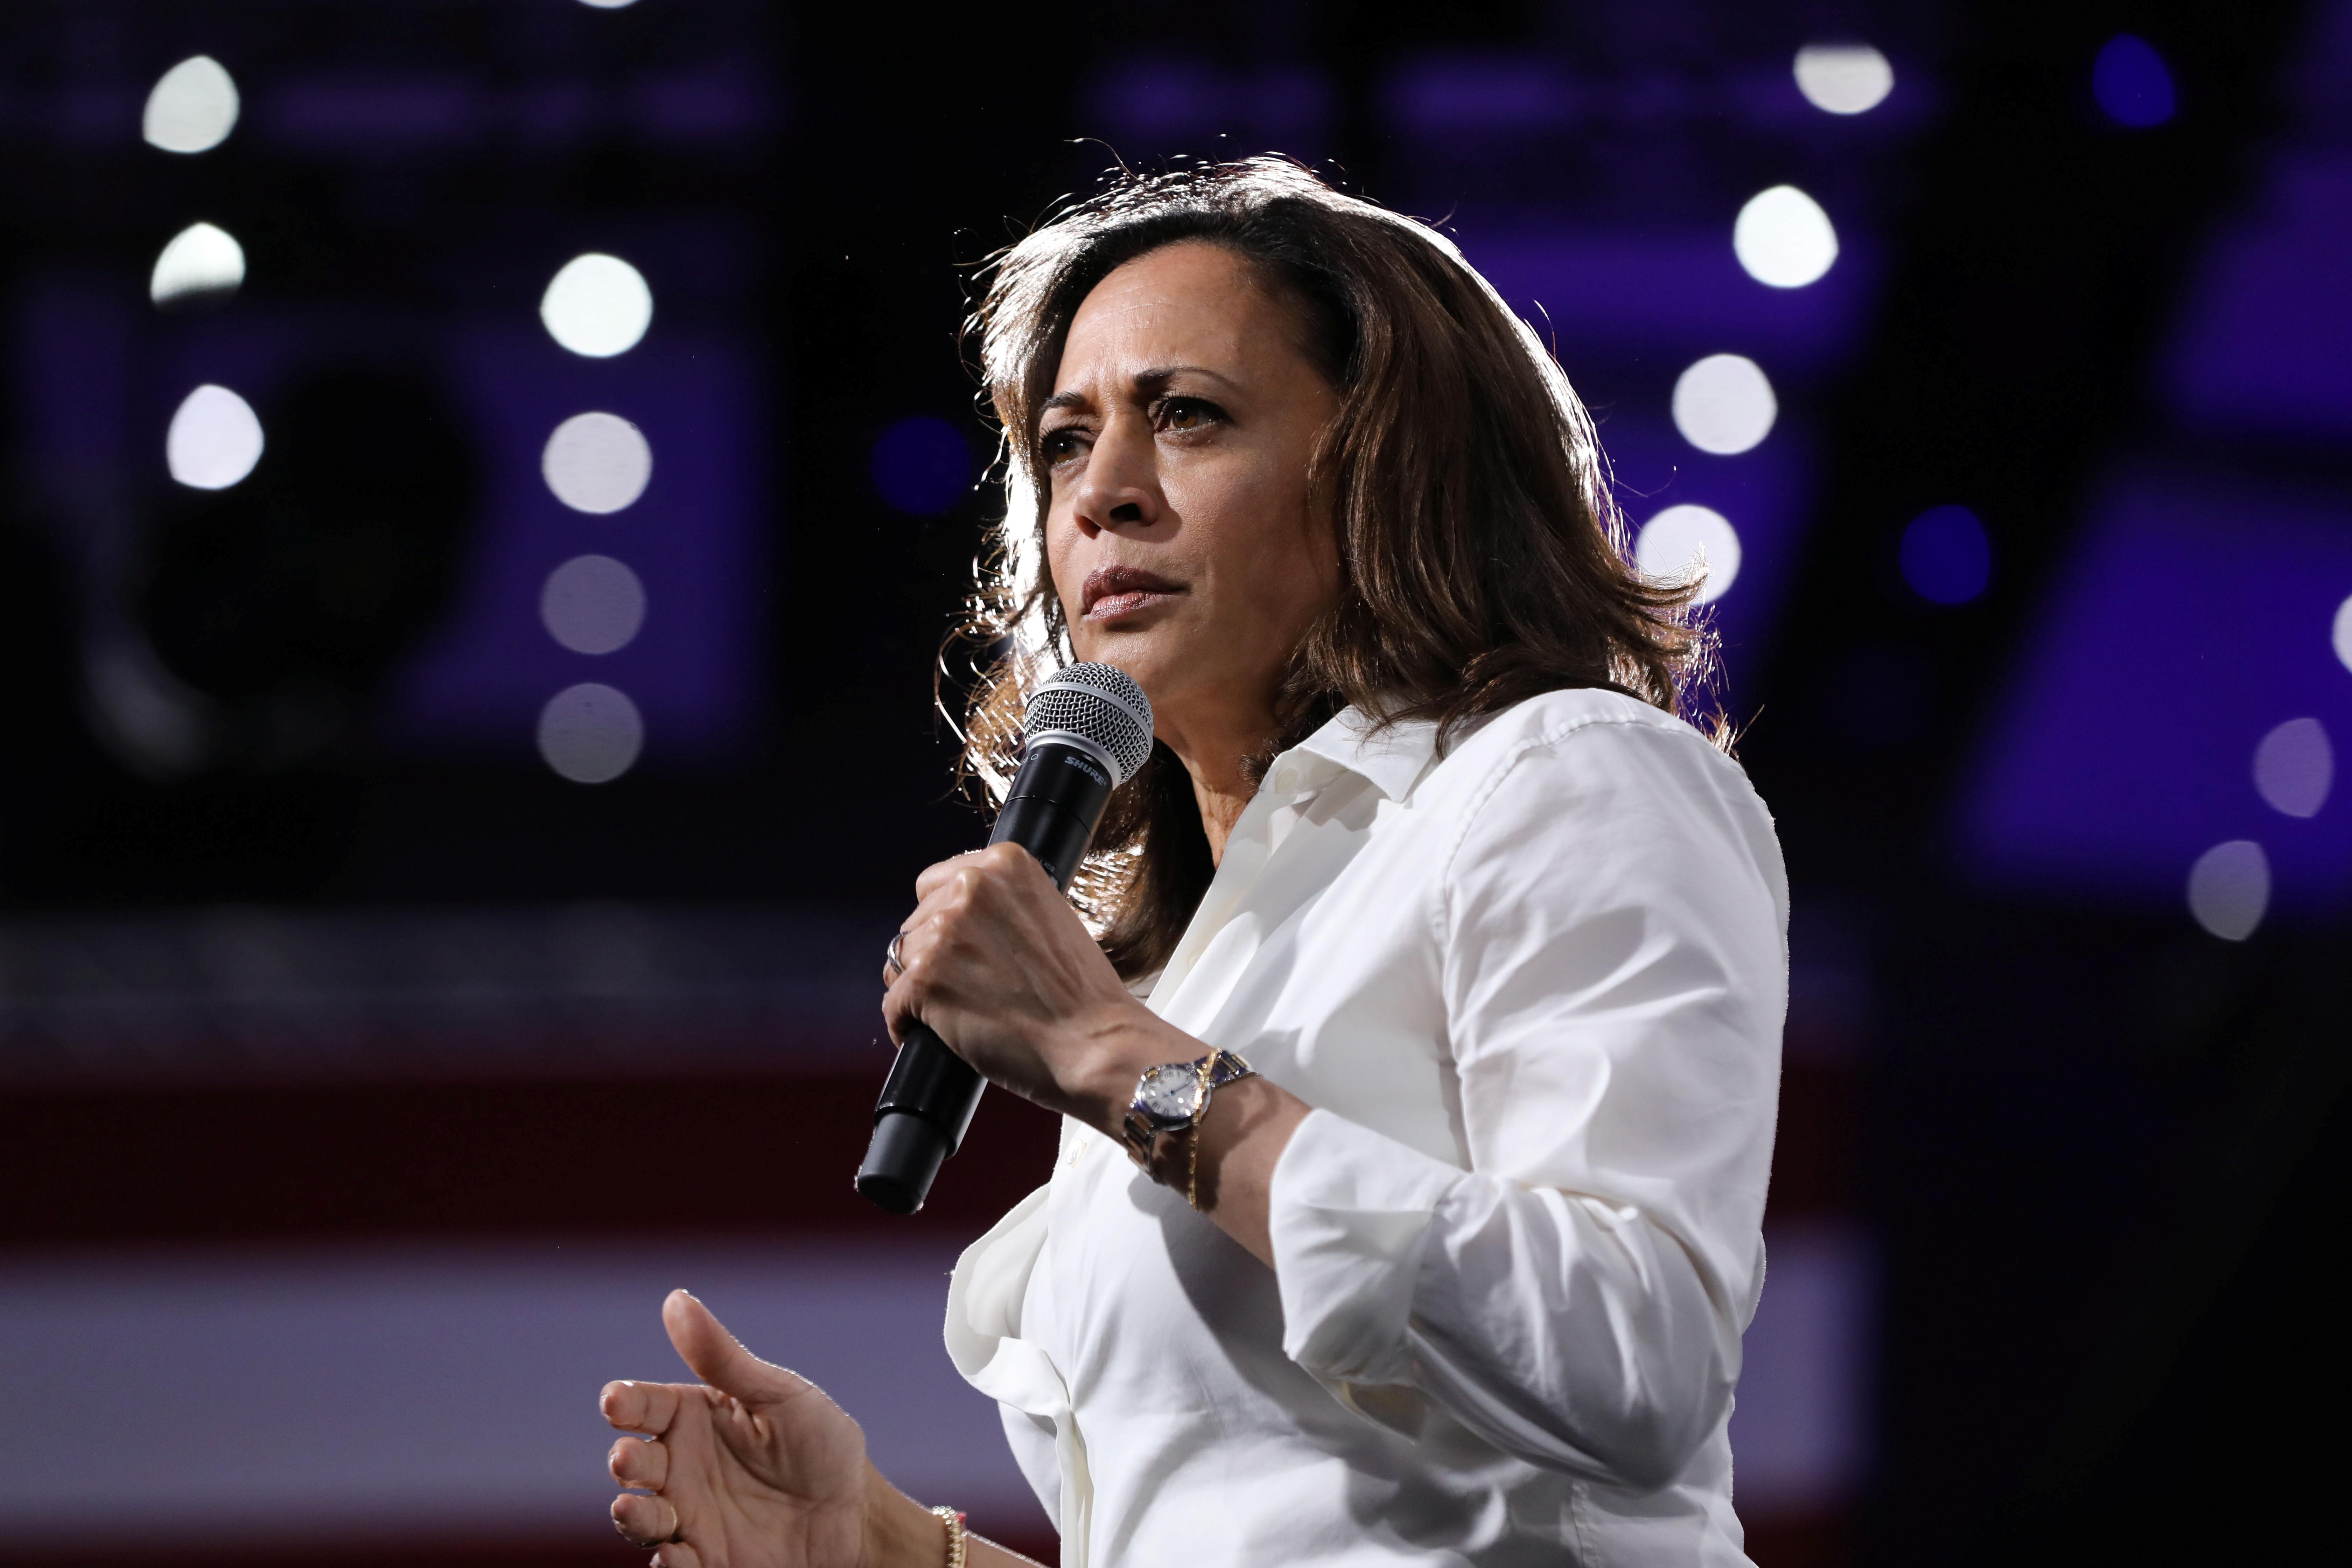 2020 Democratic U.S. presidential candidate and U.S. Senator Kamala Harris speaks during the Presidential Gun Sense Forum in Des Moines